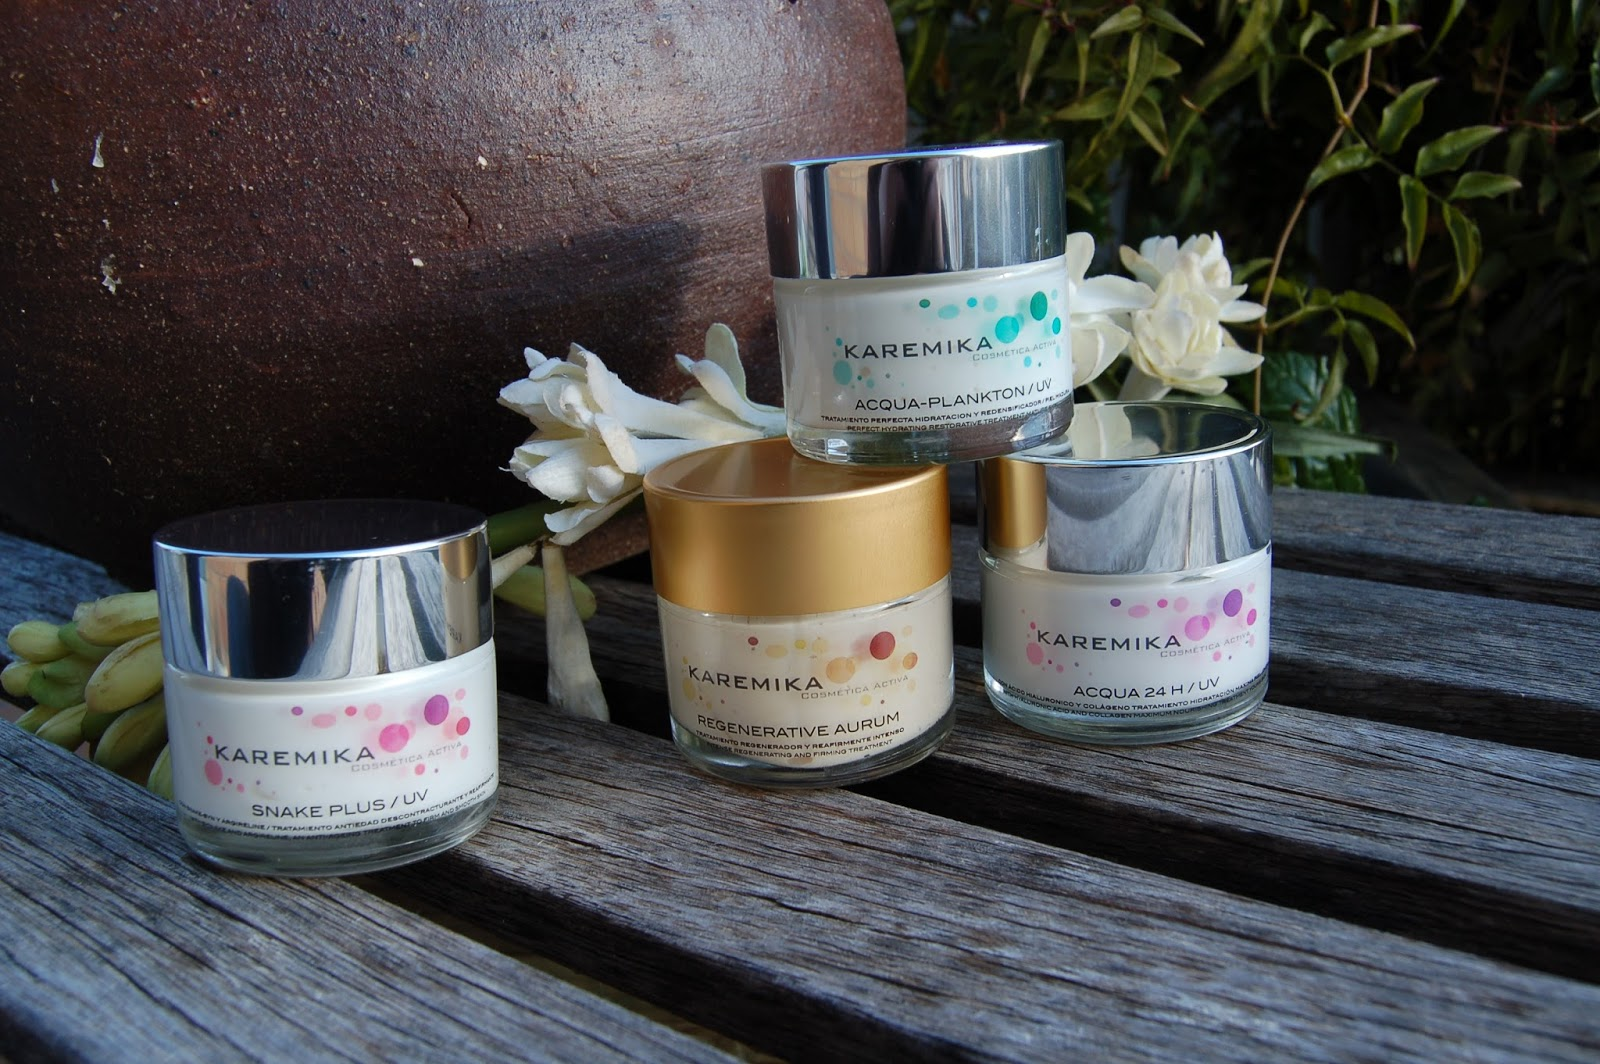 cremas karemika cosmetica activa